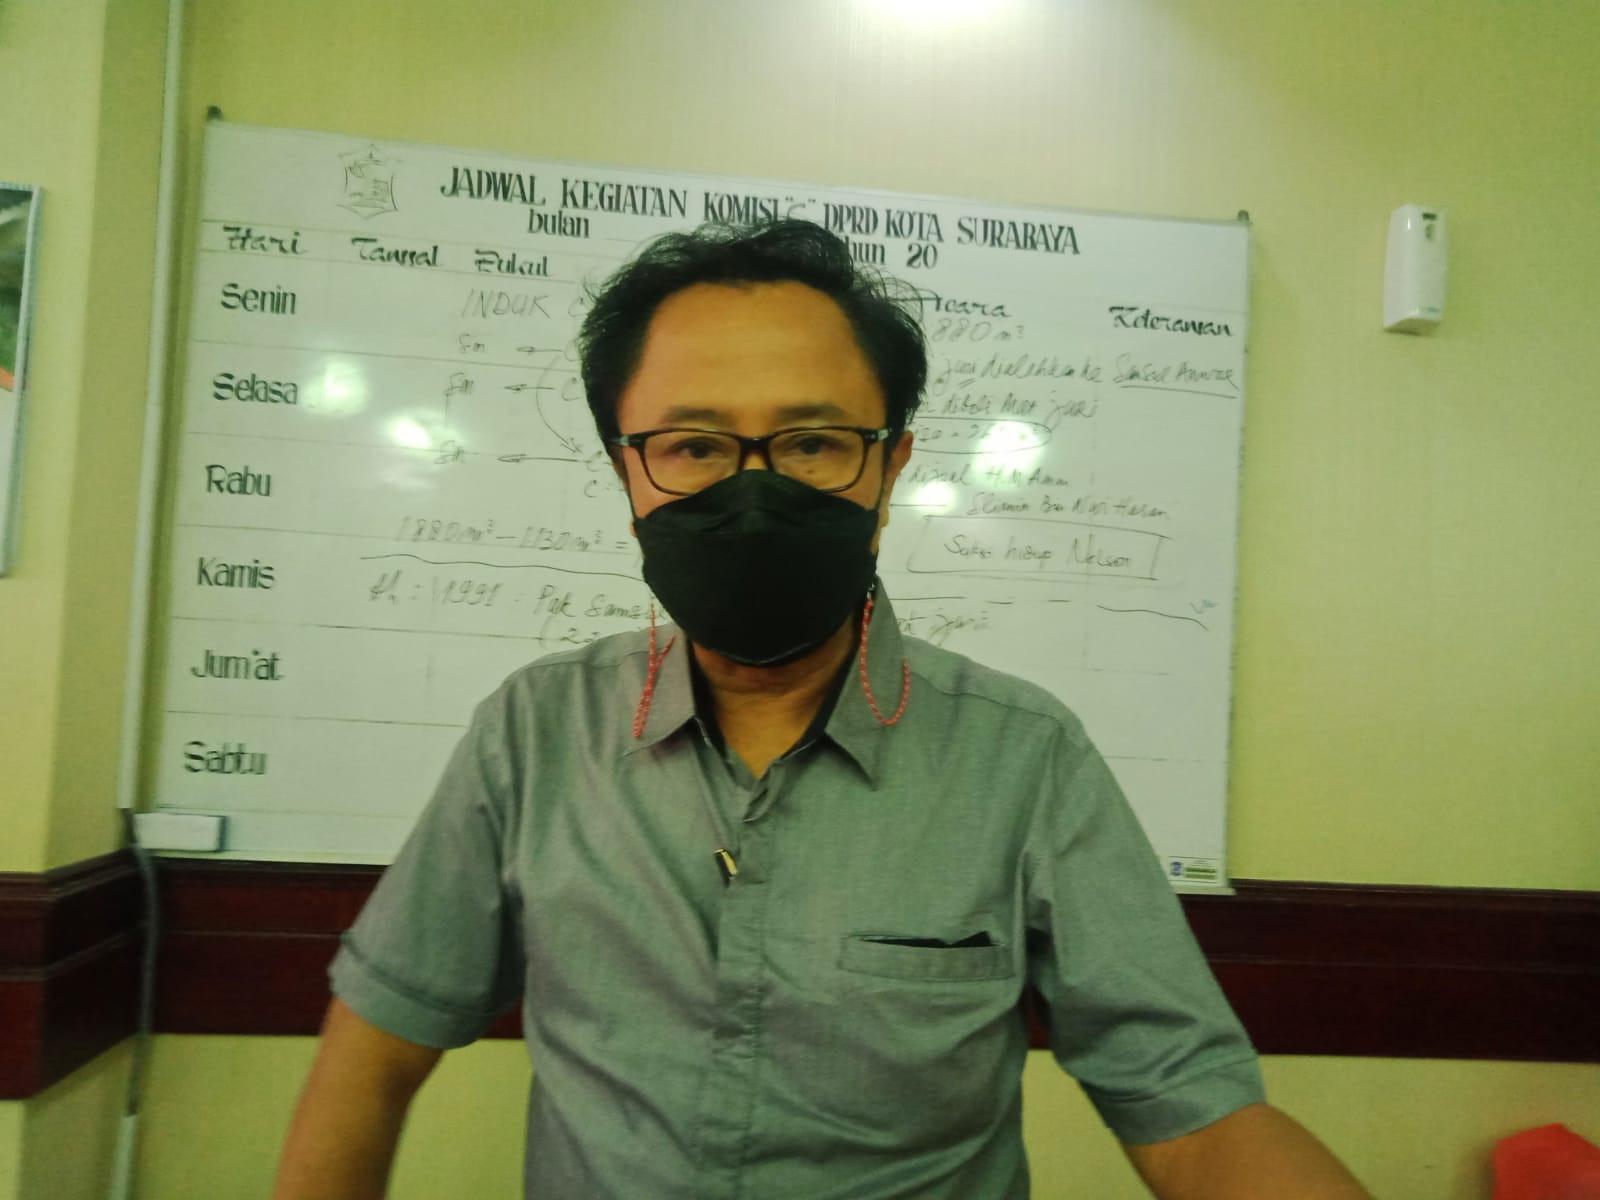 DPRD Kota Surabaya Baktiono Sentil Wakil Wali Kota Cak Armuji - JPNN.com